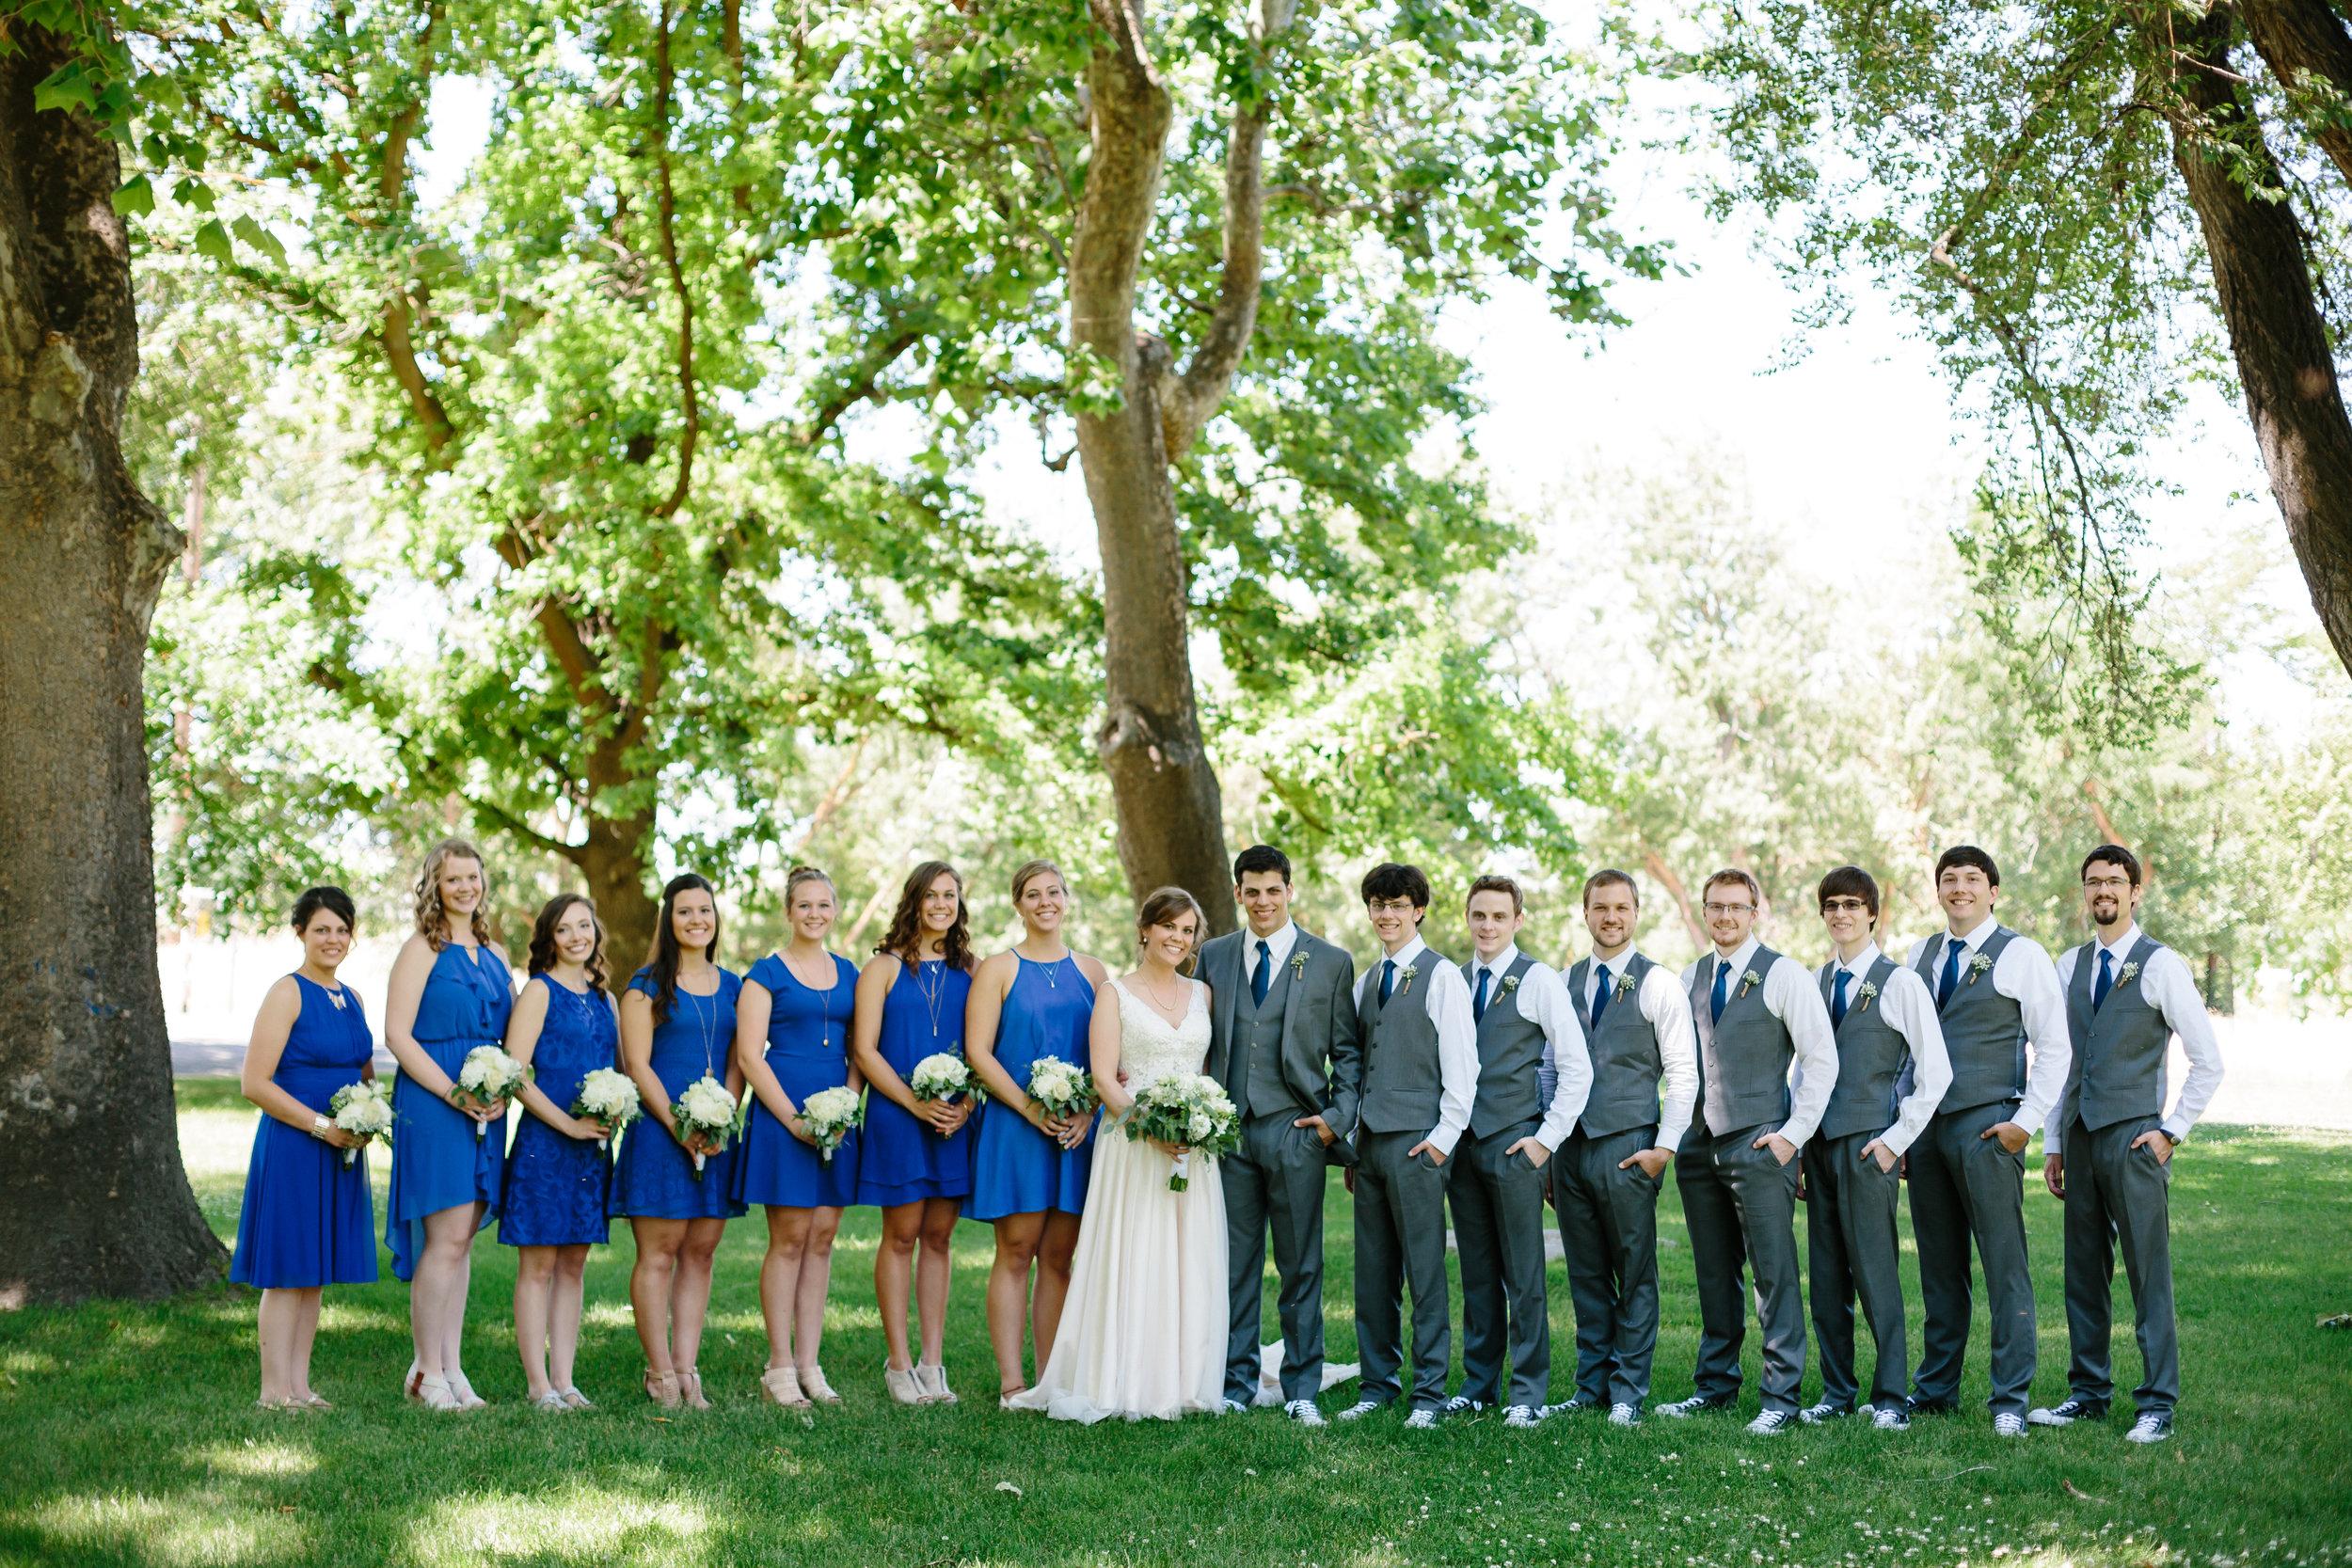 Jordan & Shantel Married - Idaho - Corrie Mick Photography-139.jpg